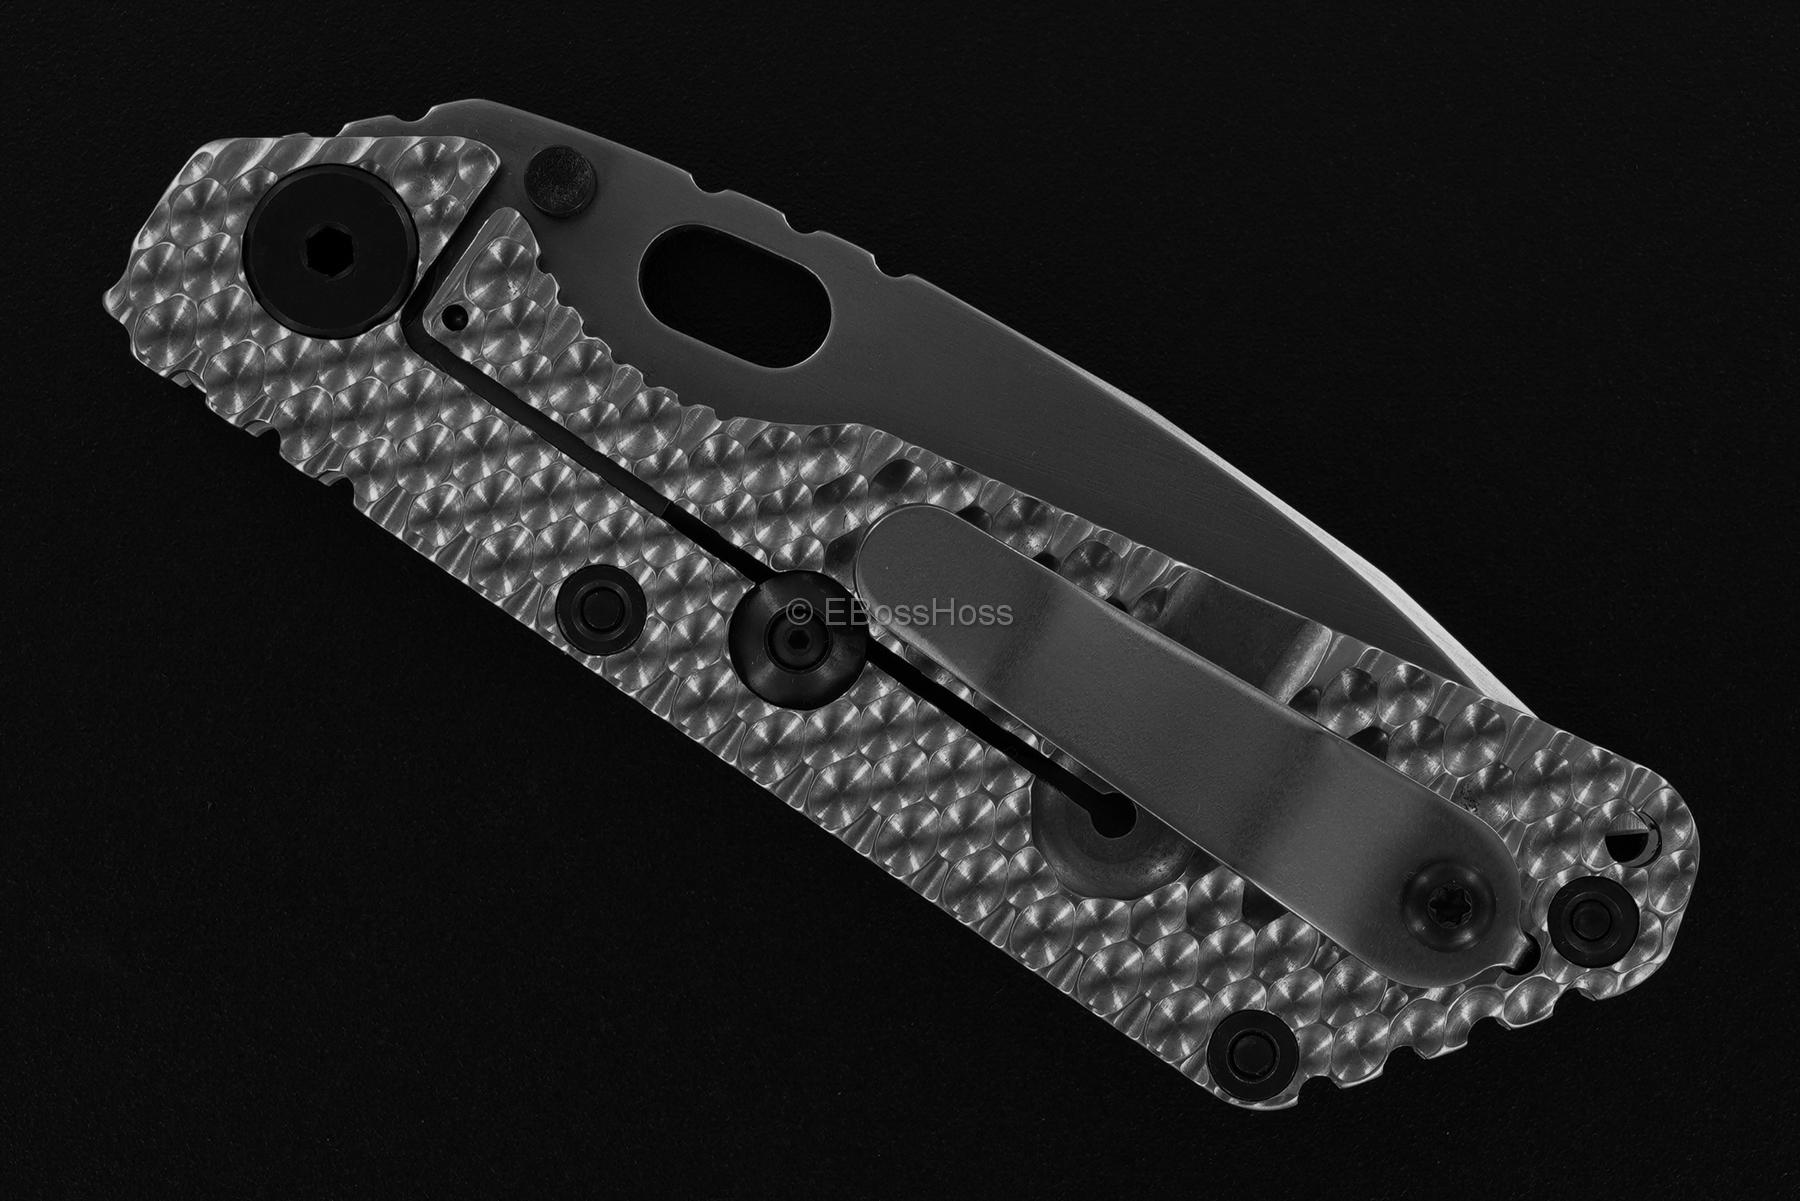 Duane Dwyer (Strider Knives) Custom SnG Tanto